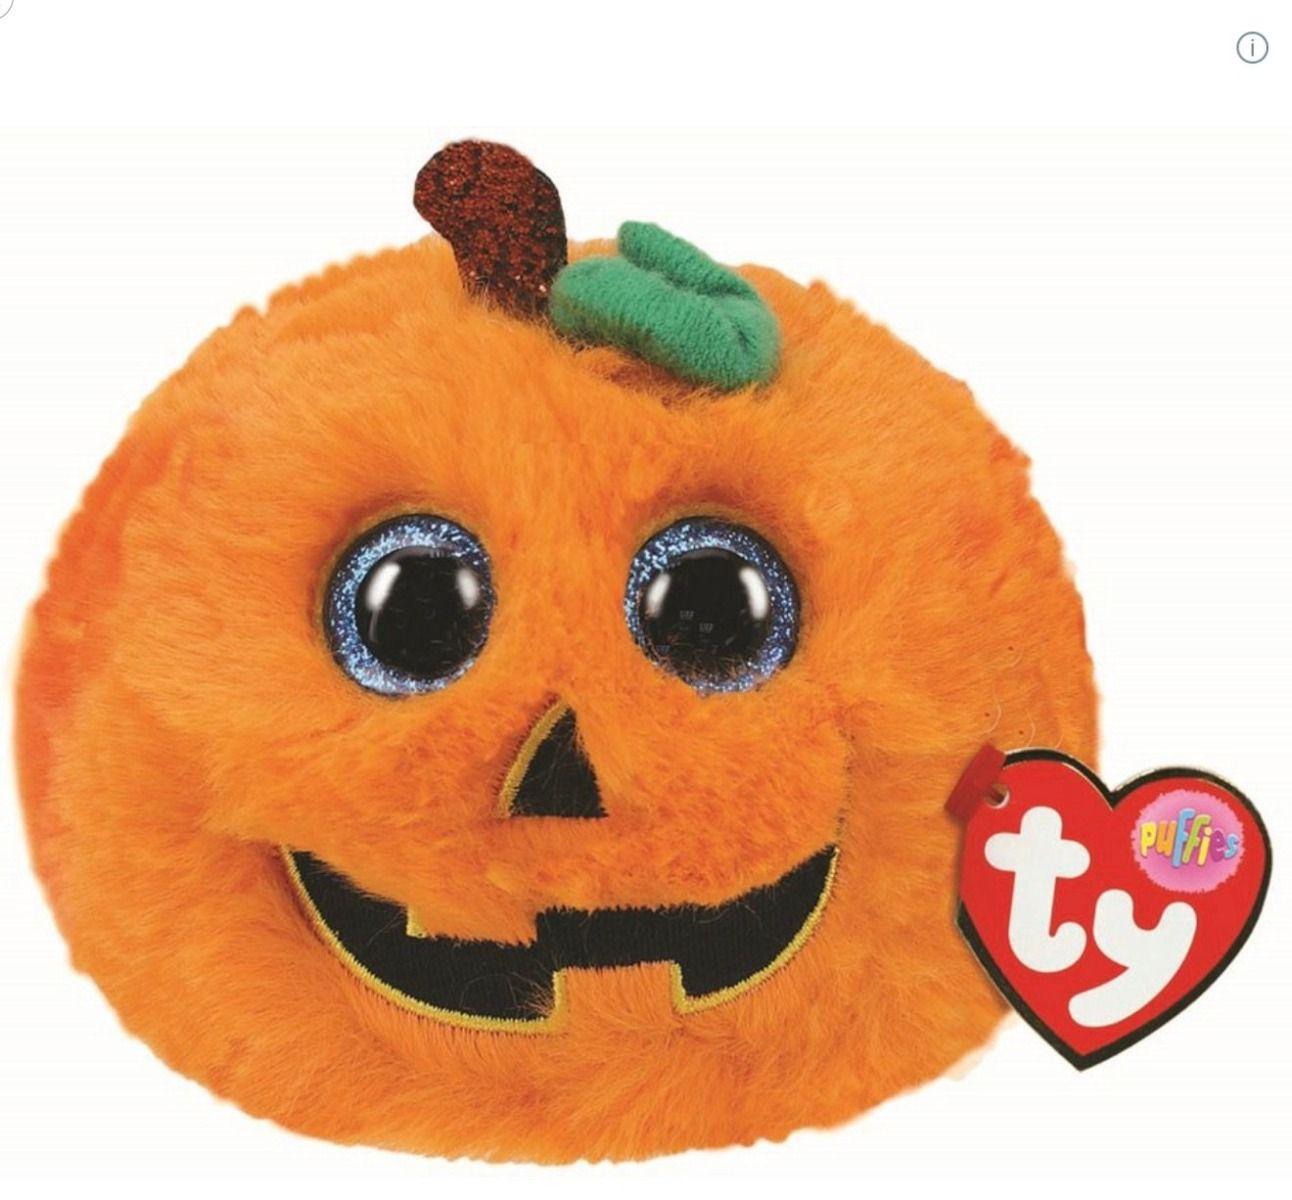 TY Seeds Pumpkin Halloween Limited Edition Puffie 7cm 42516